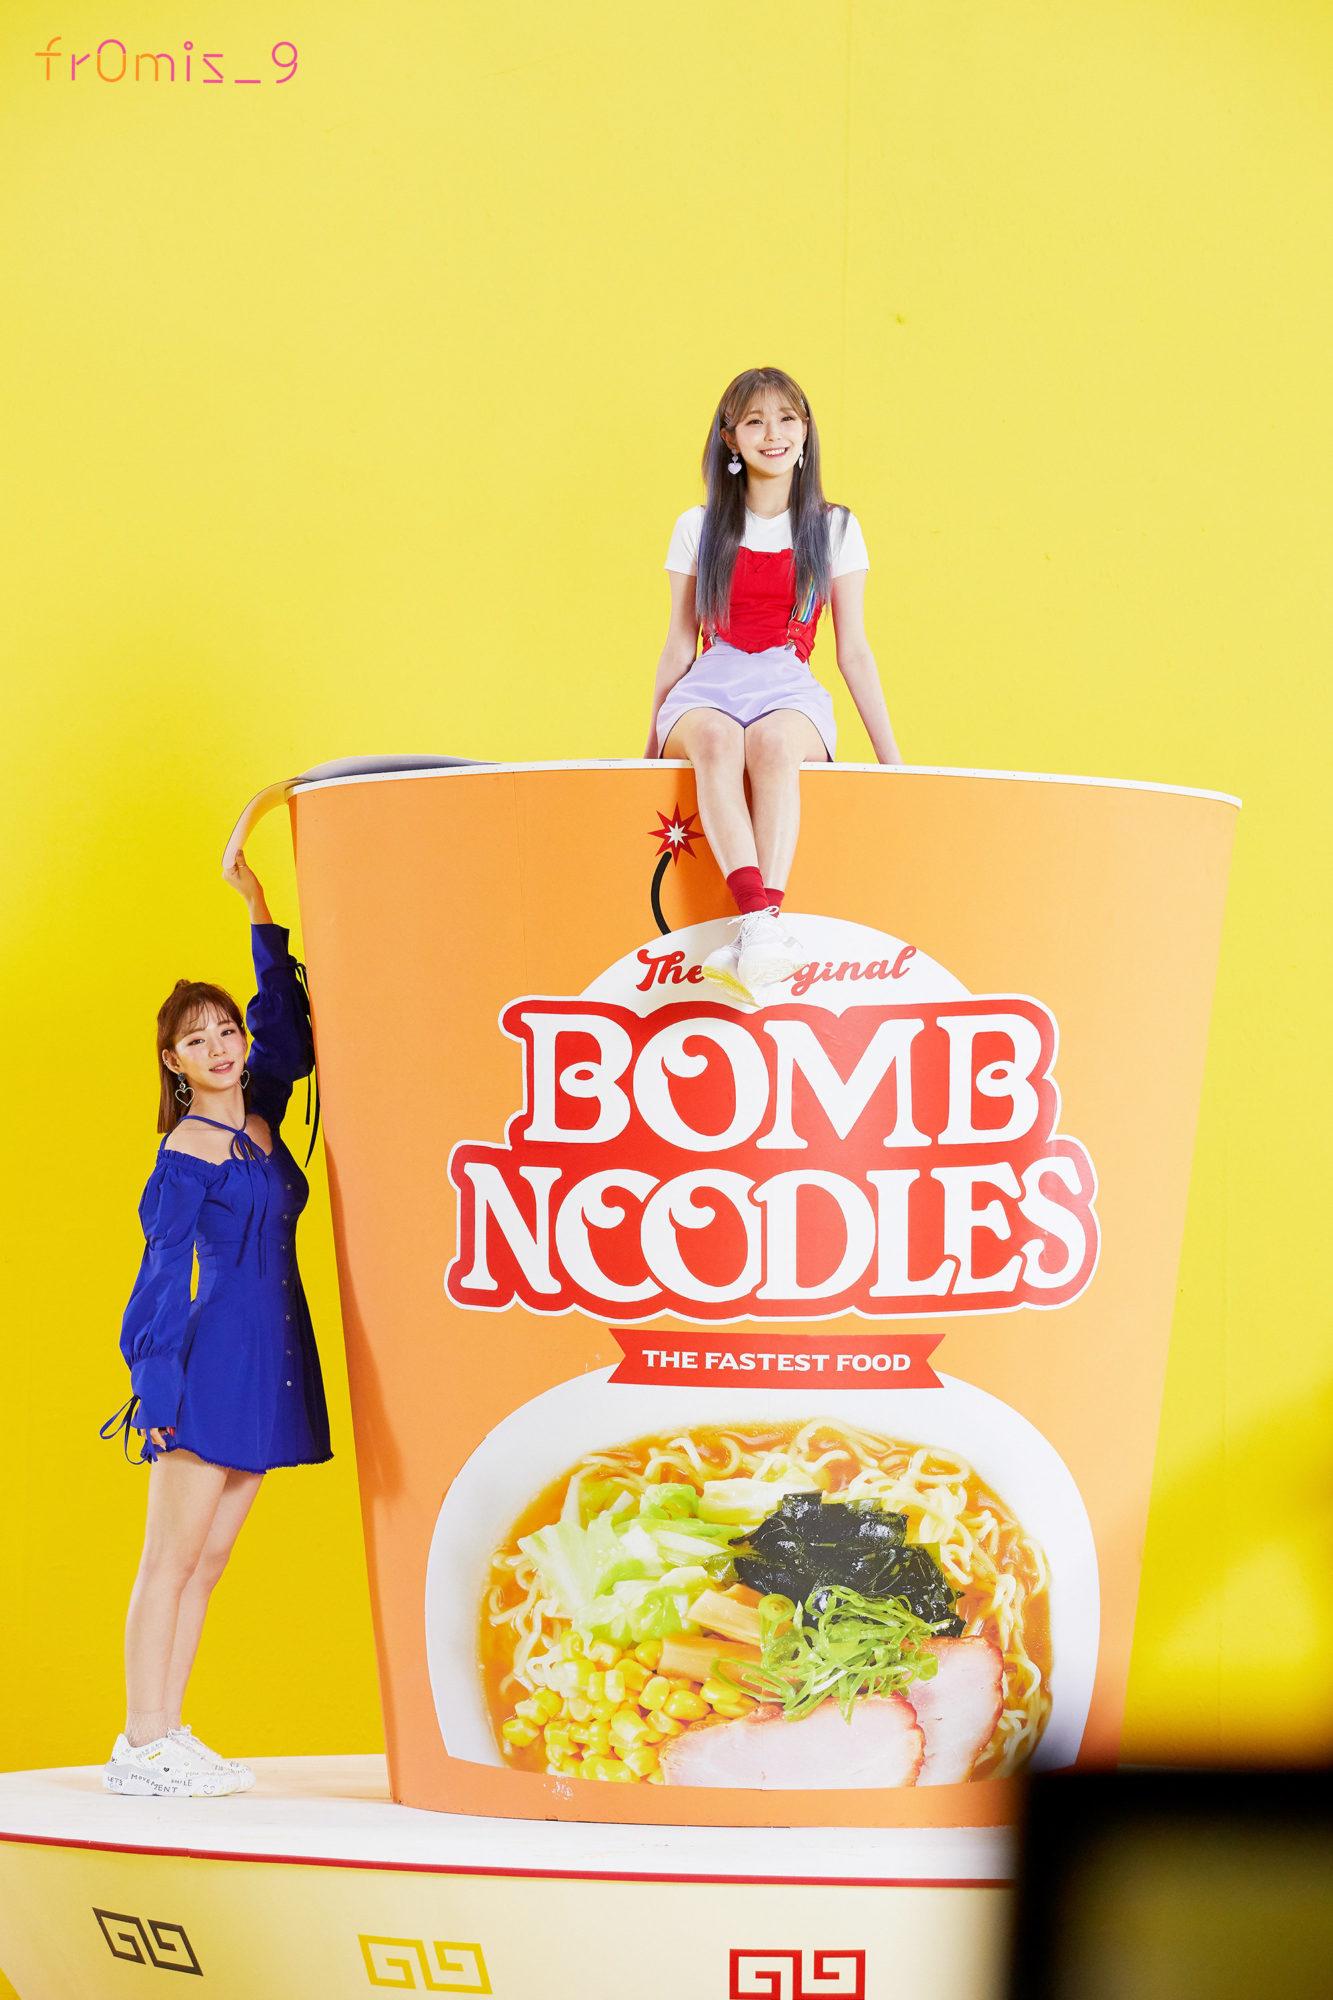 fromis_9 Chaeyoung Jiheon Fun